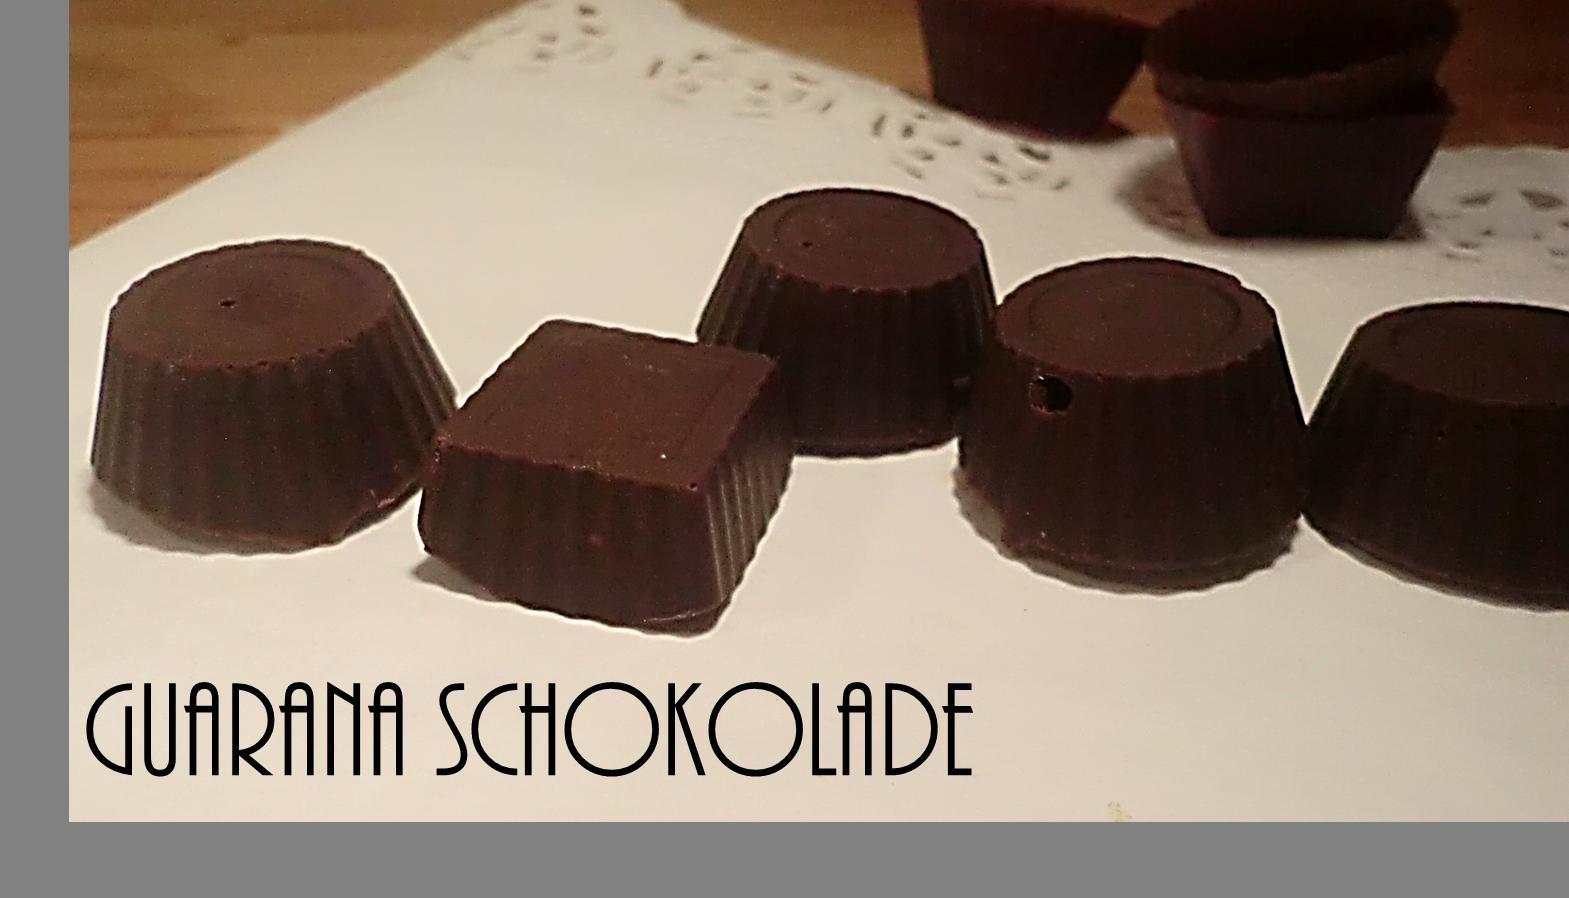 Guarana Schokolade